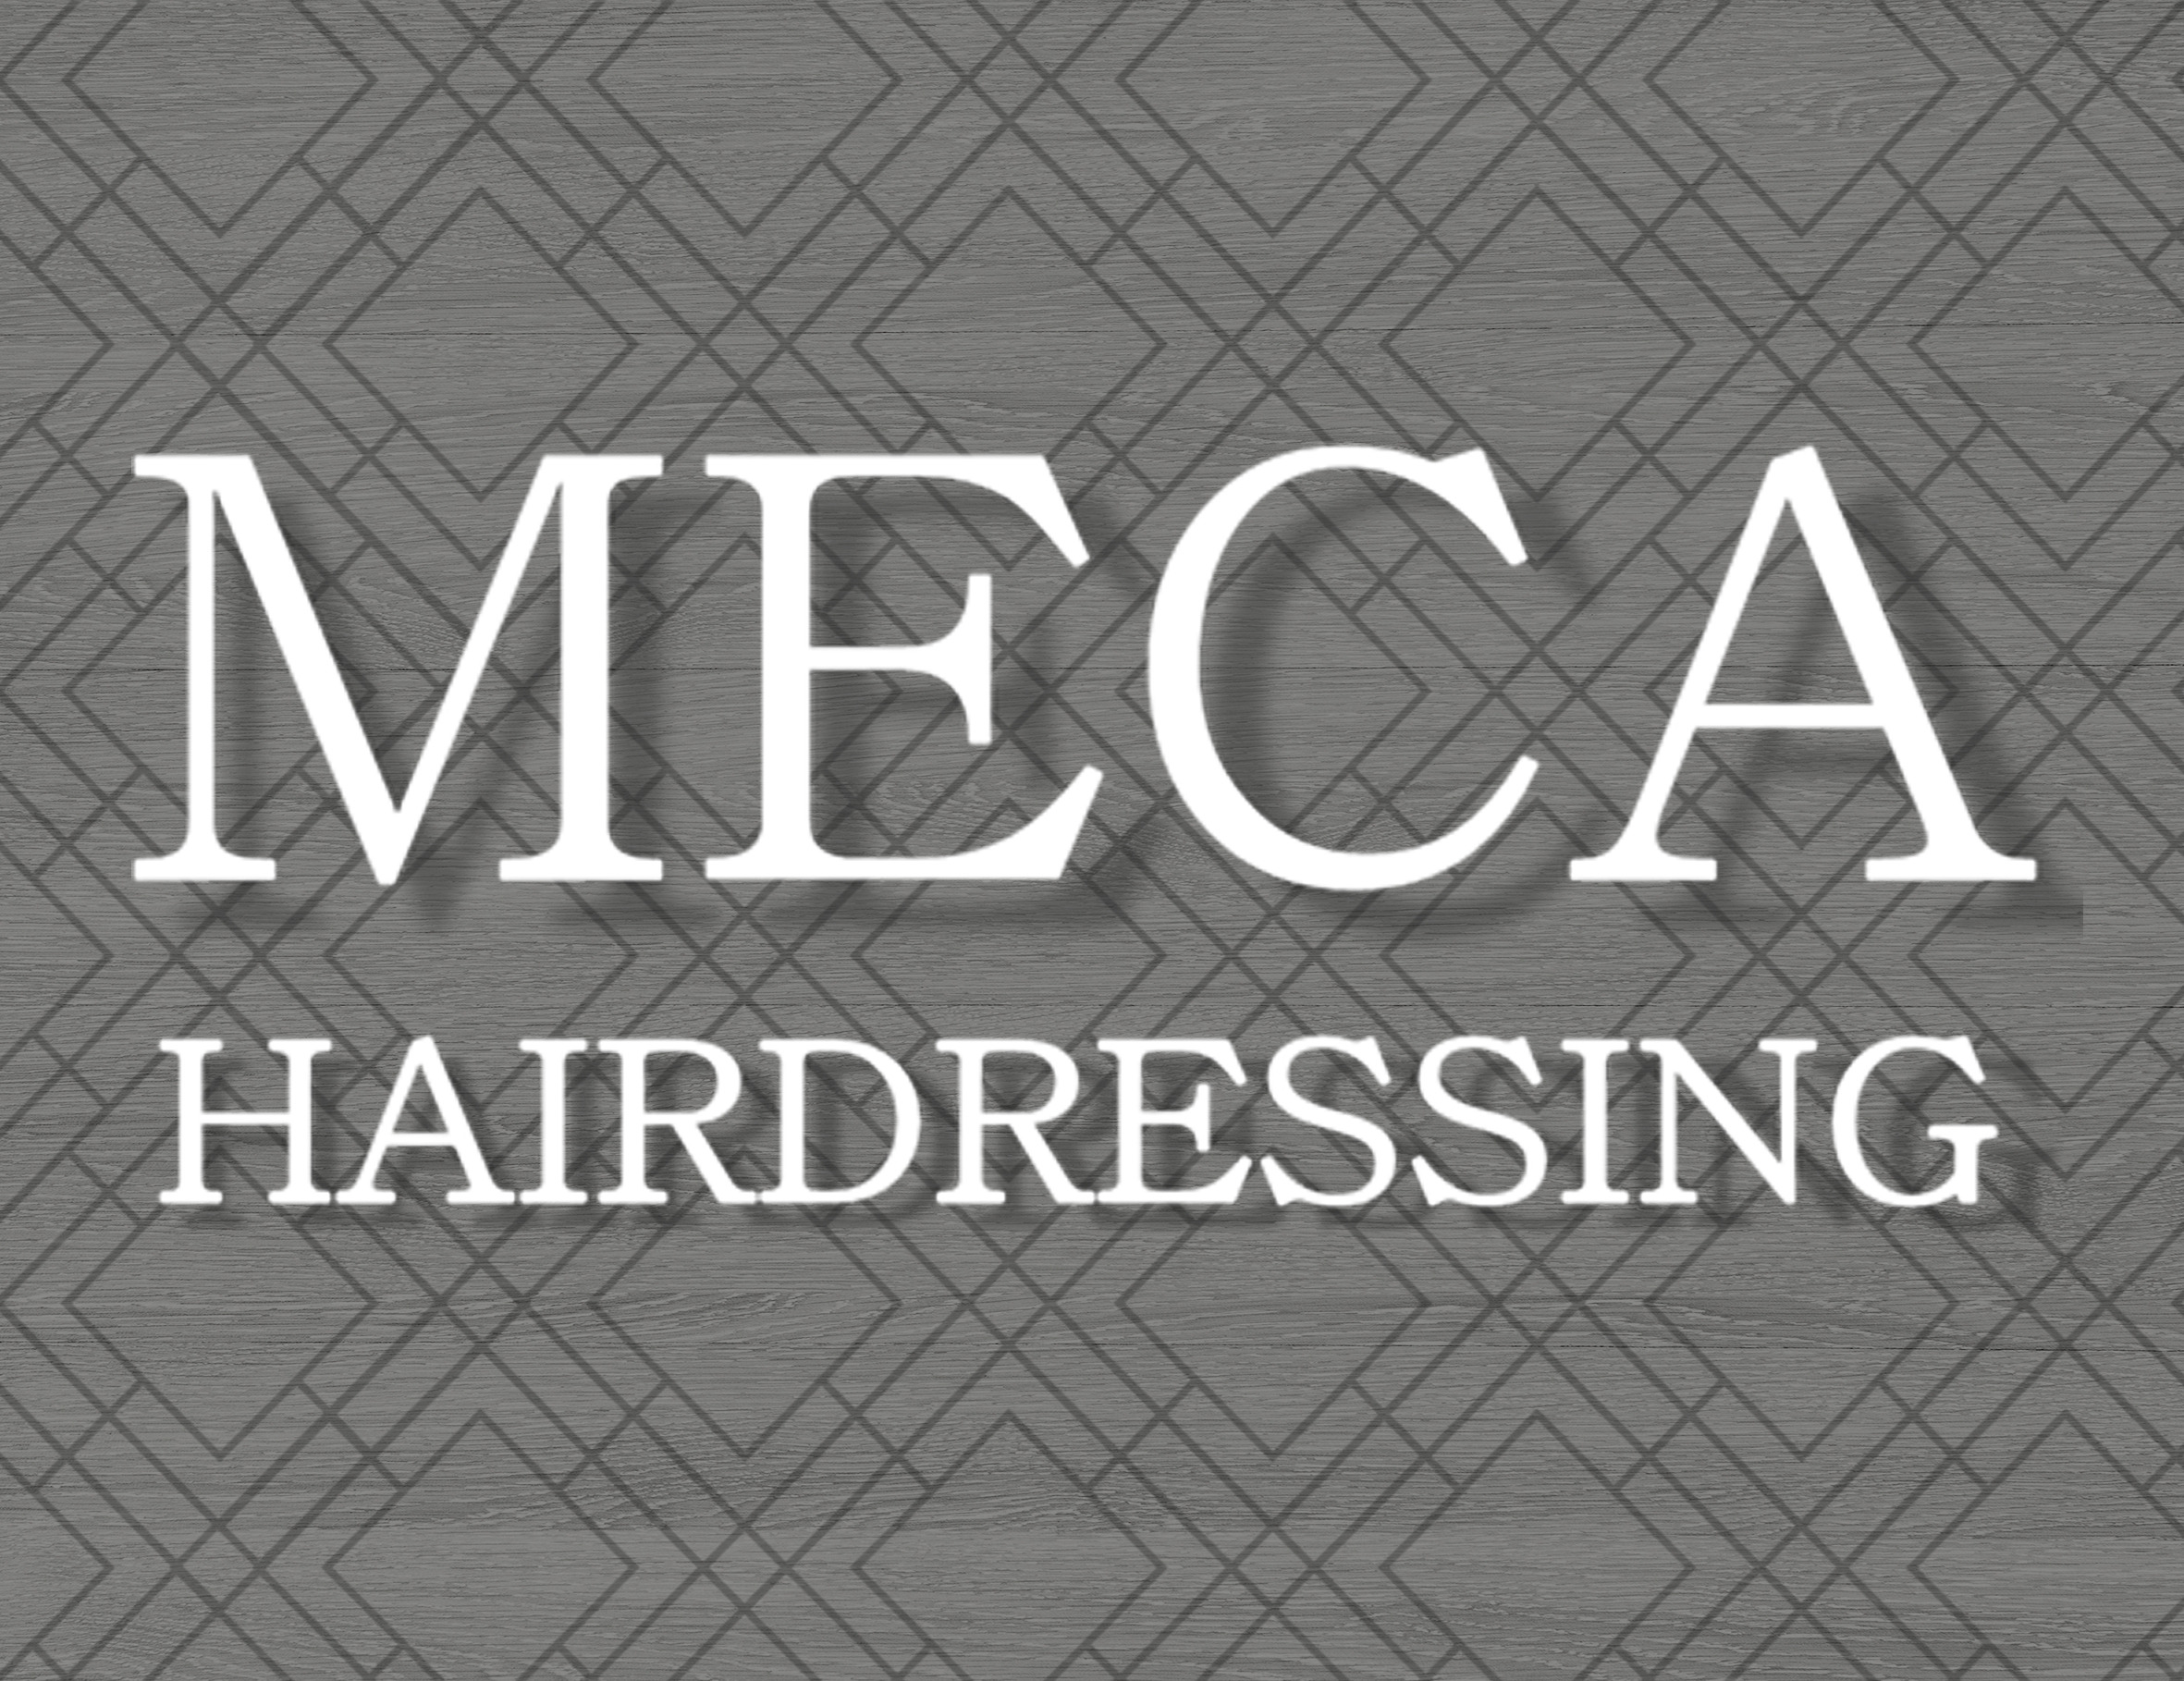 Meca Hairdressing